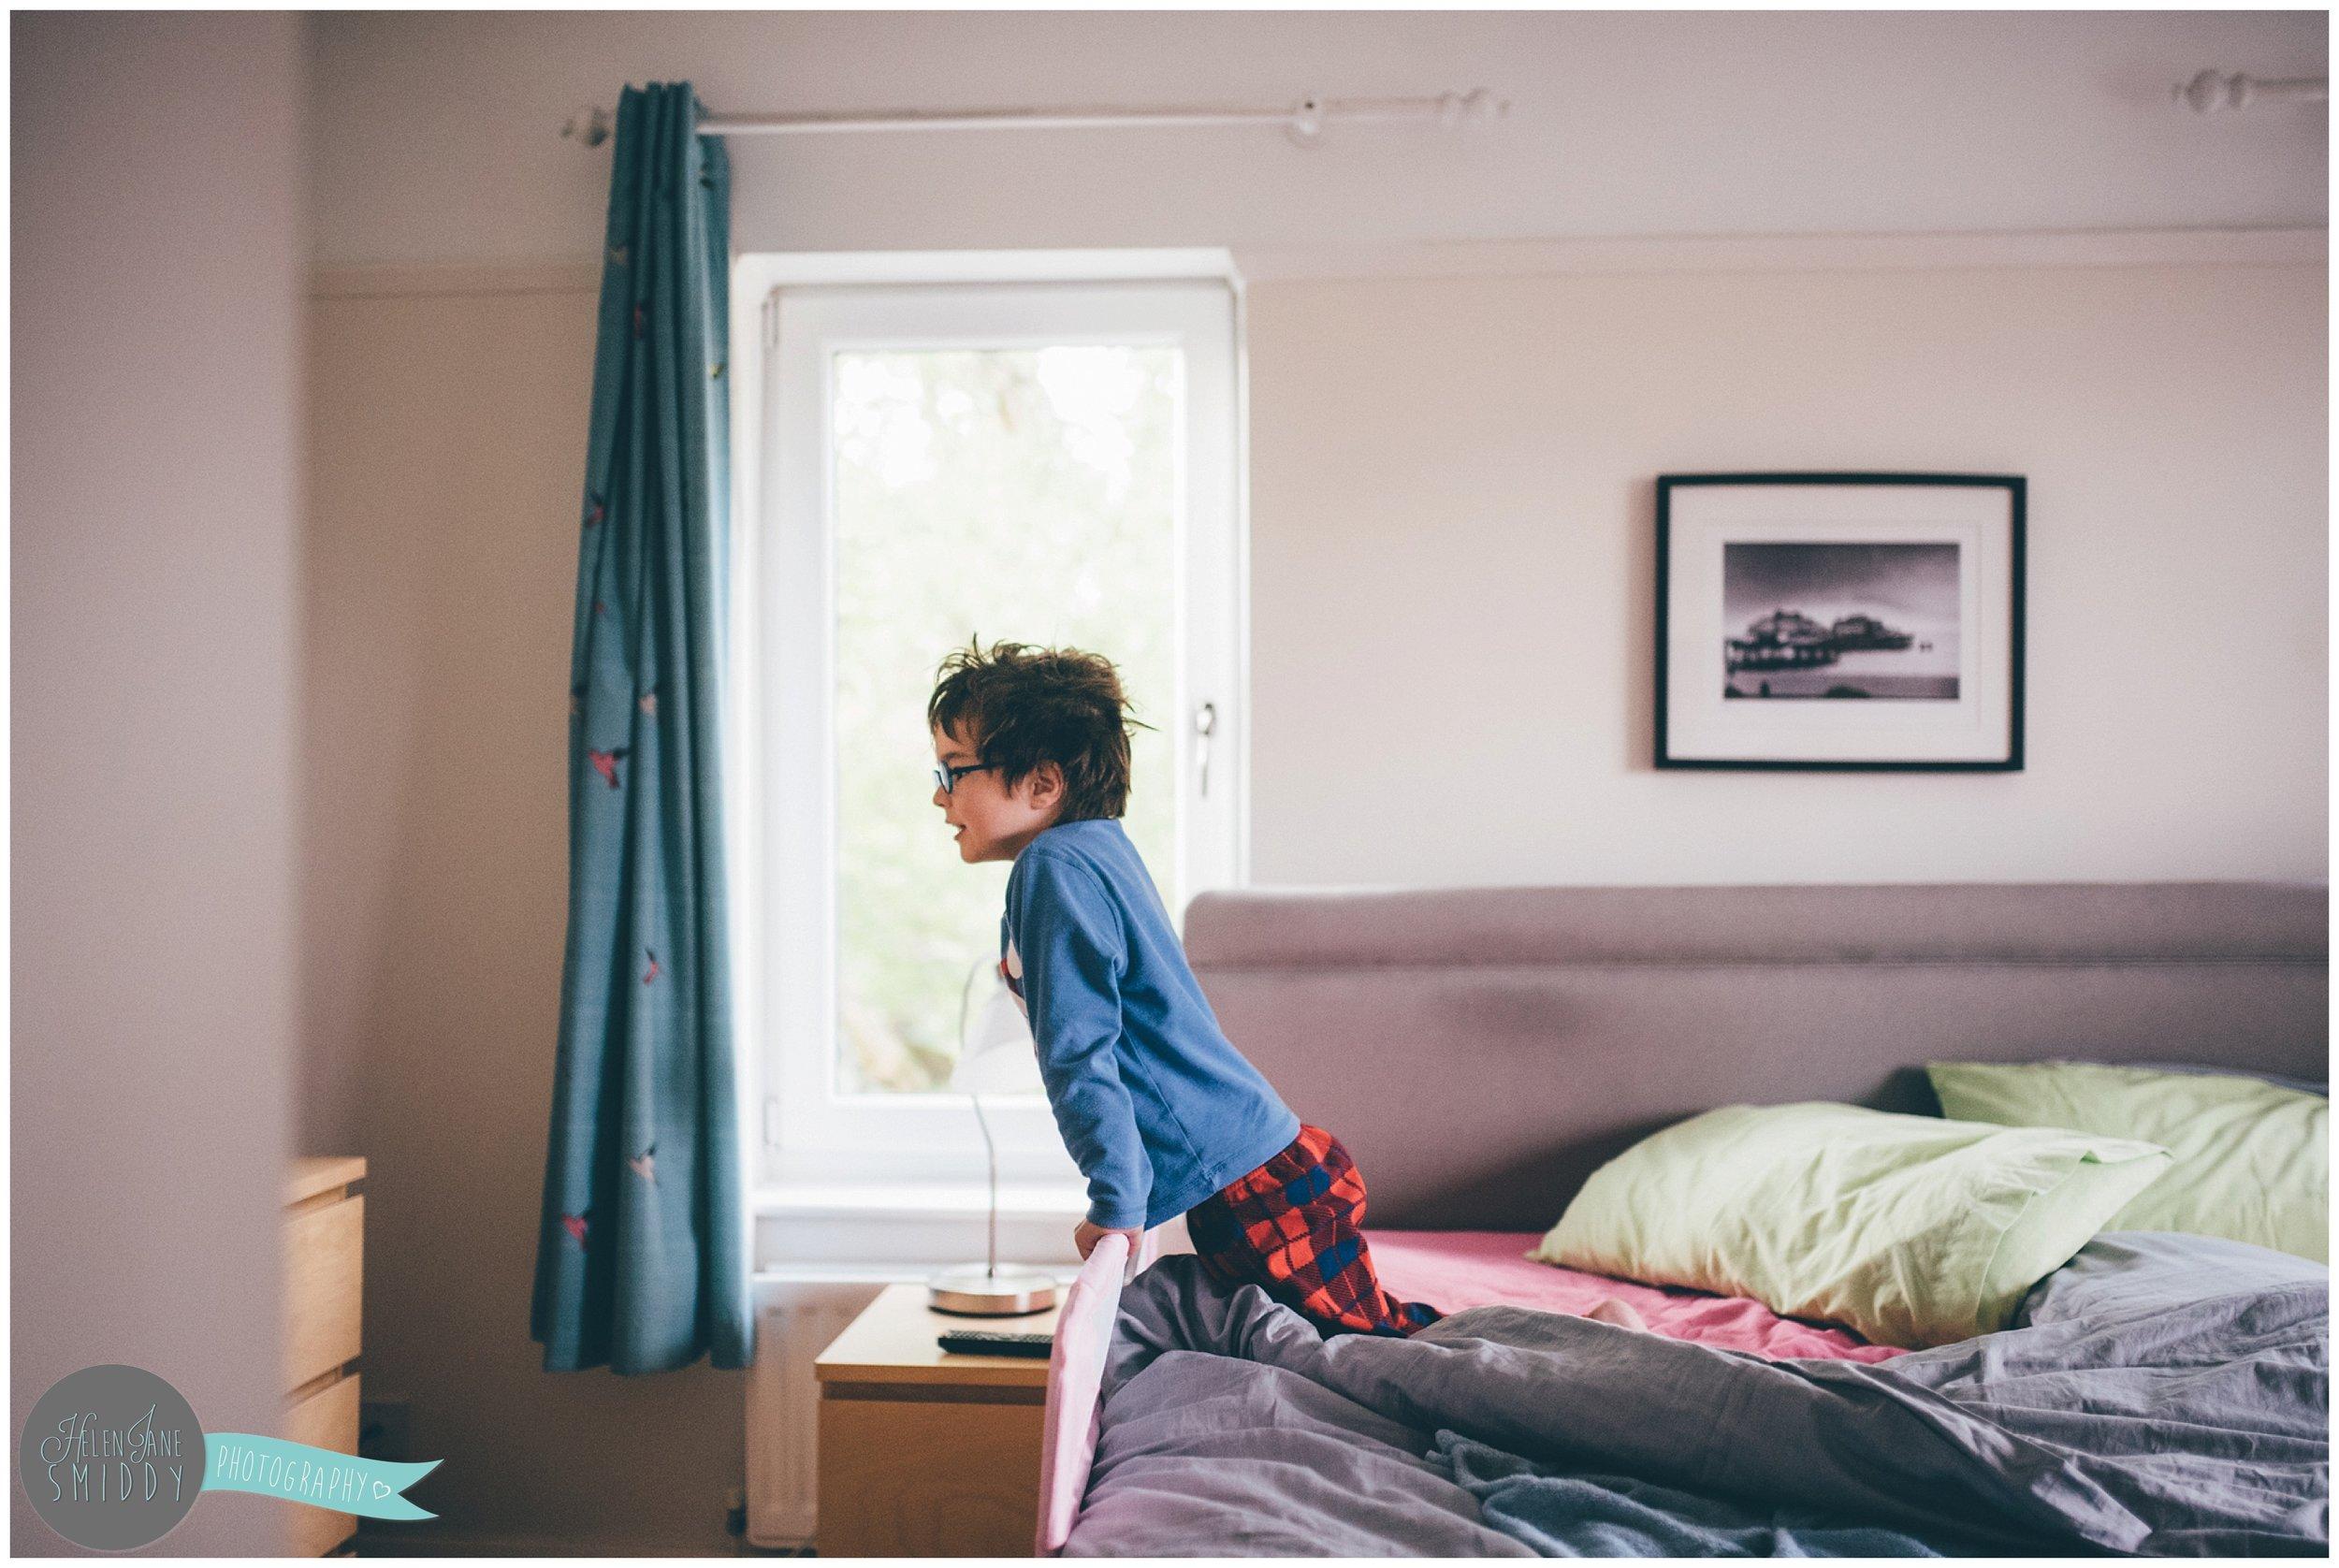 Isaac stares at cartoons on his Mum's bed in his pyjamas.